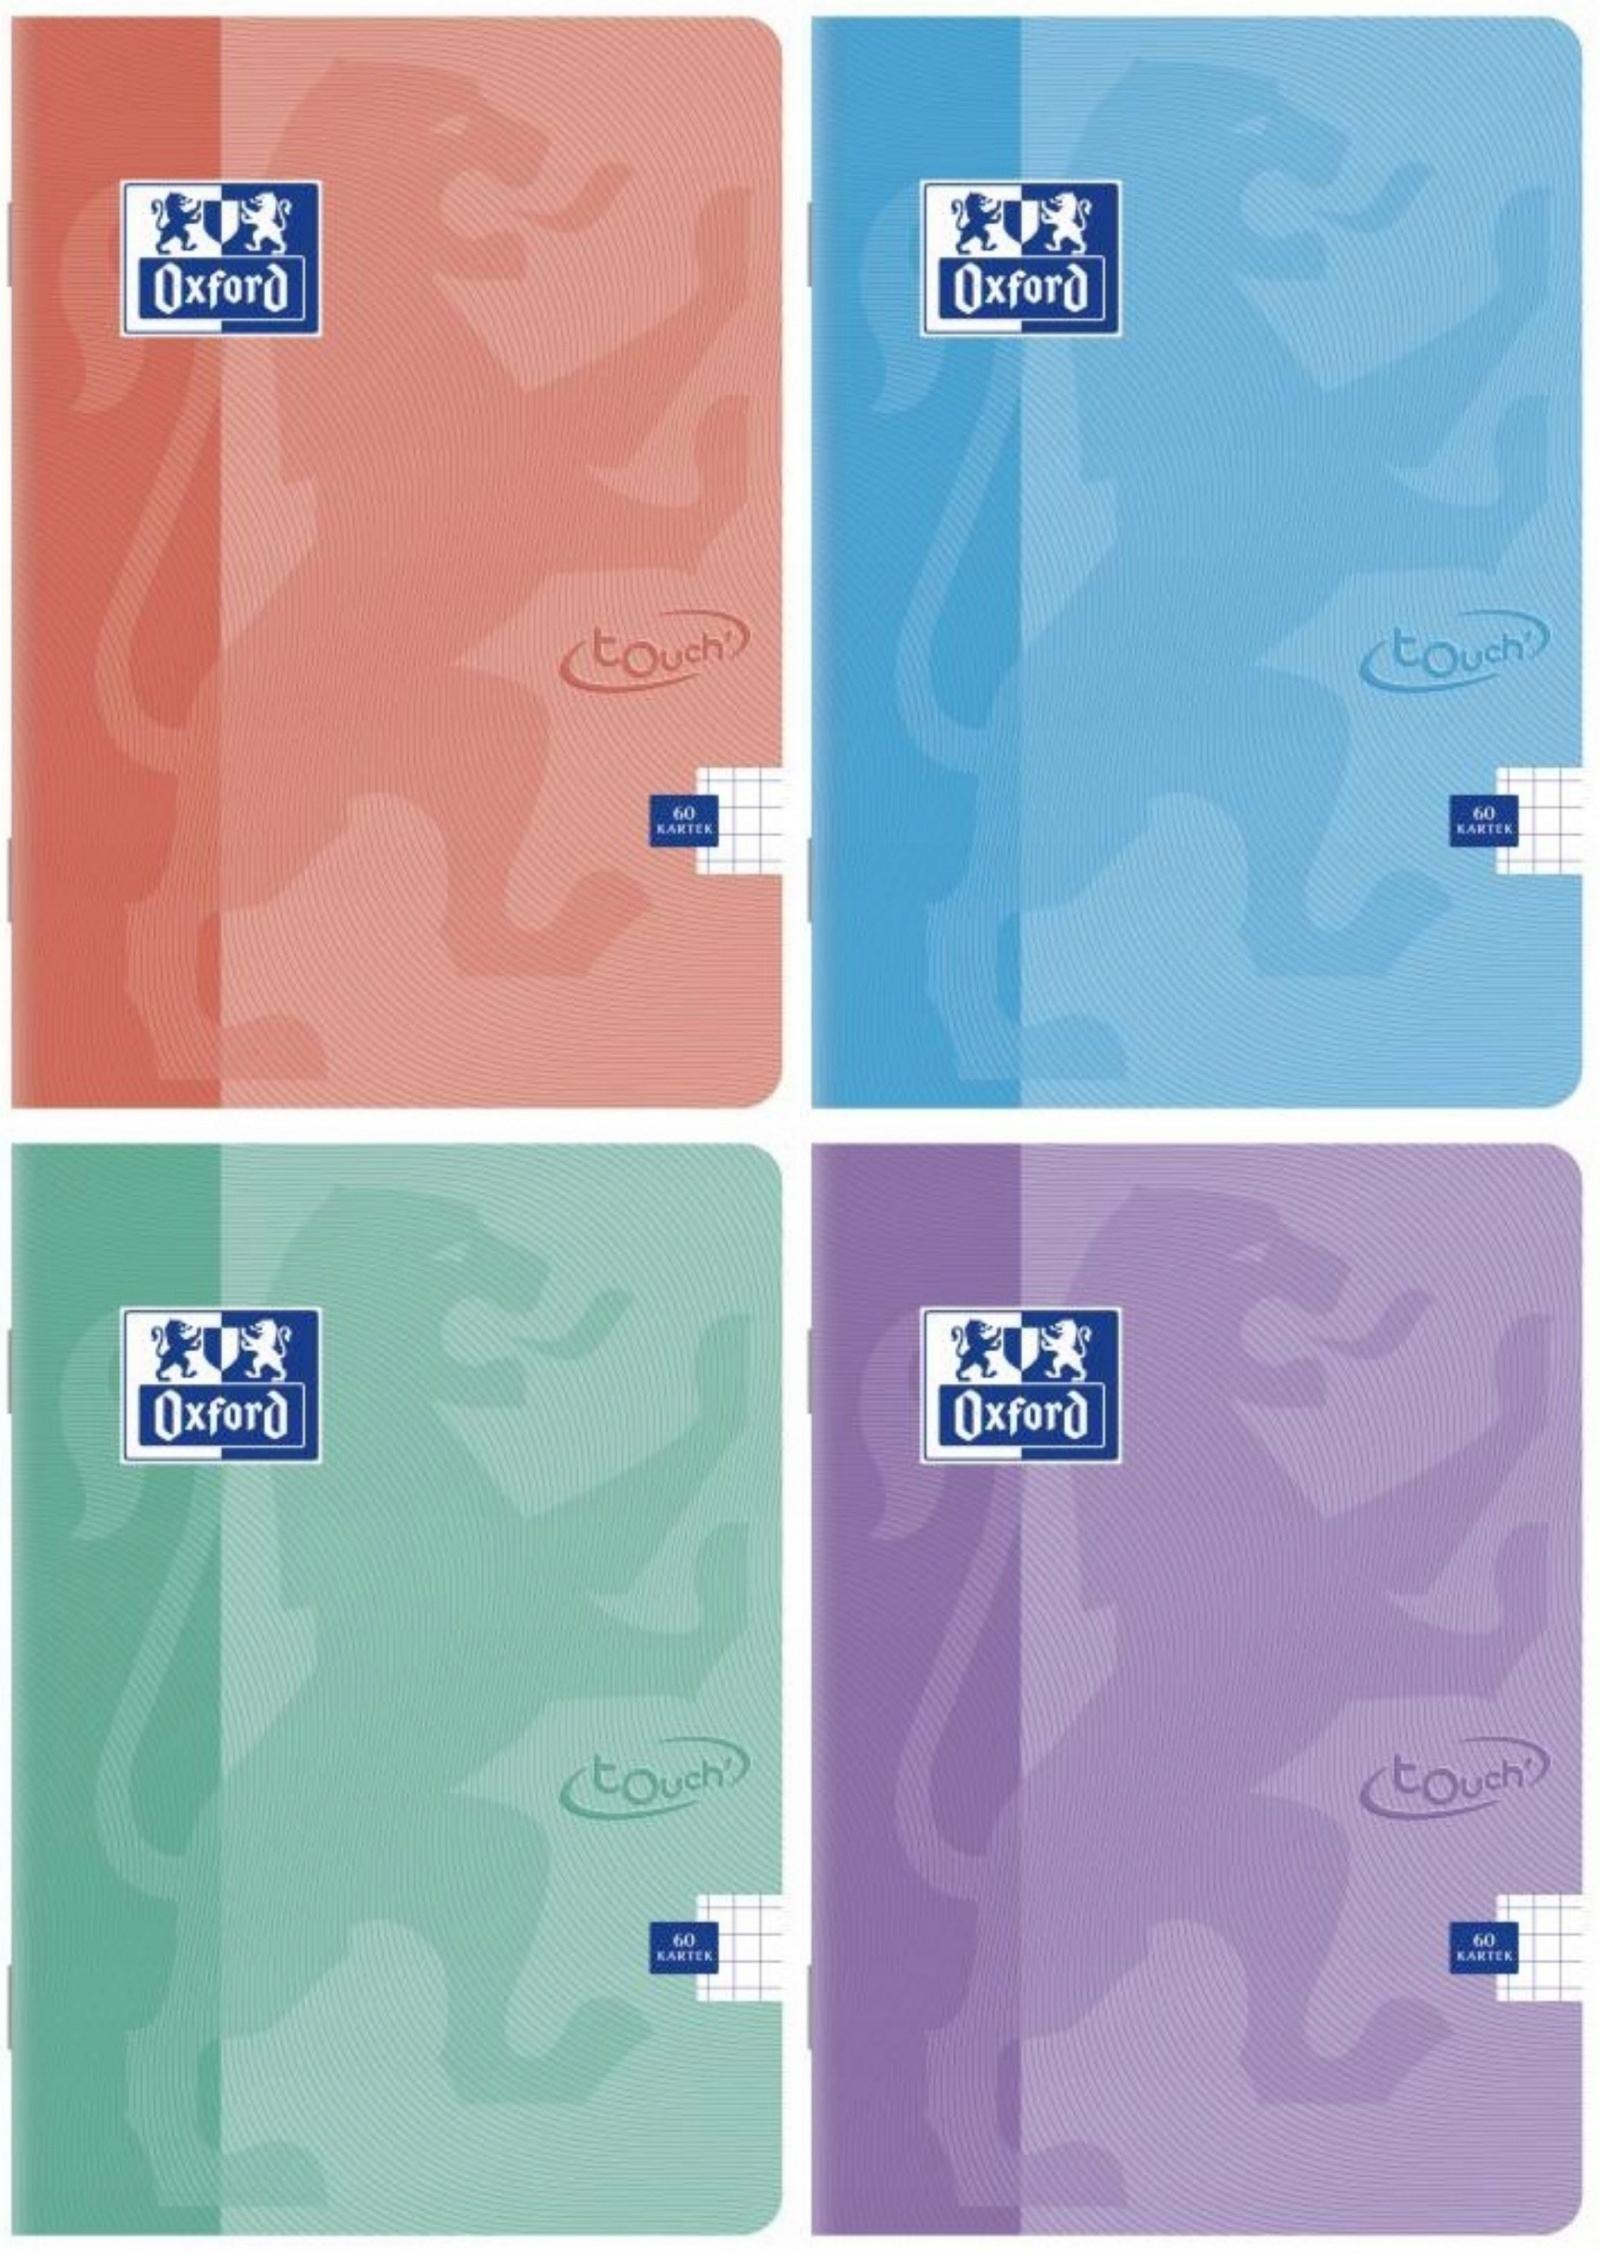 Oxford Zeszyt A5 60 Kartek Kratka Touch Pastel X 4 8361393174 Allegro Pl